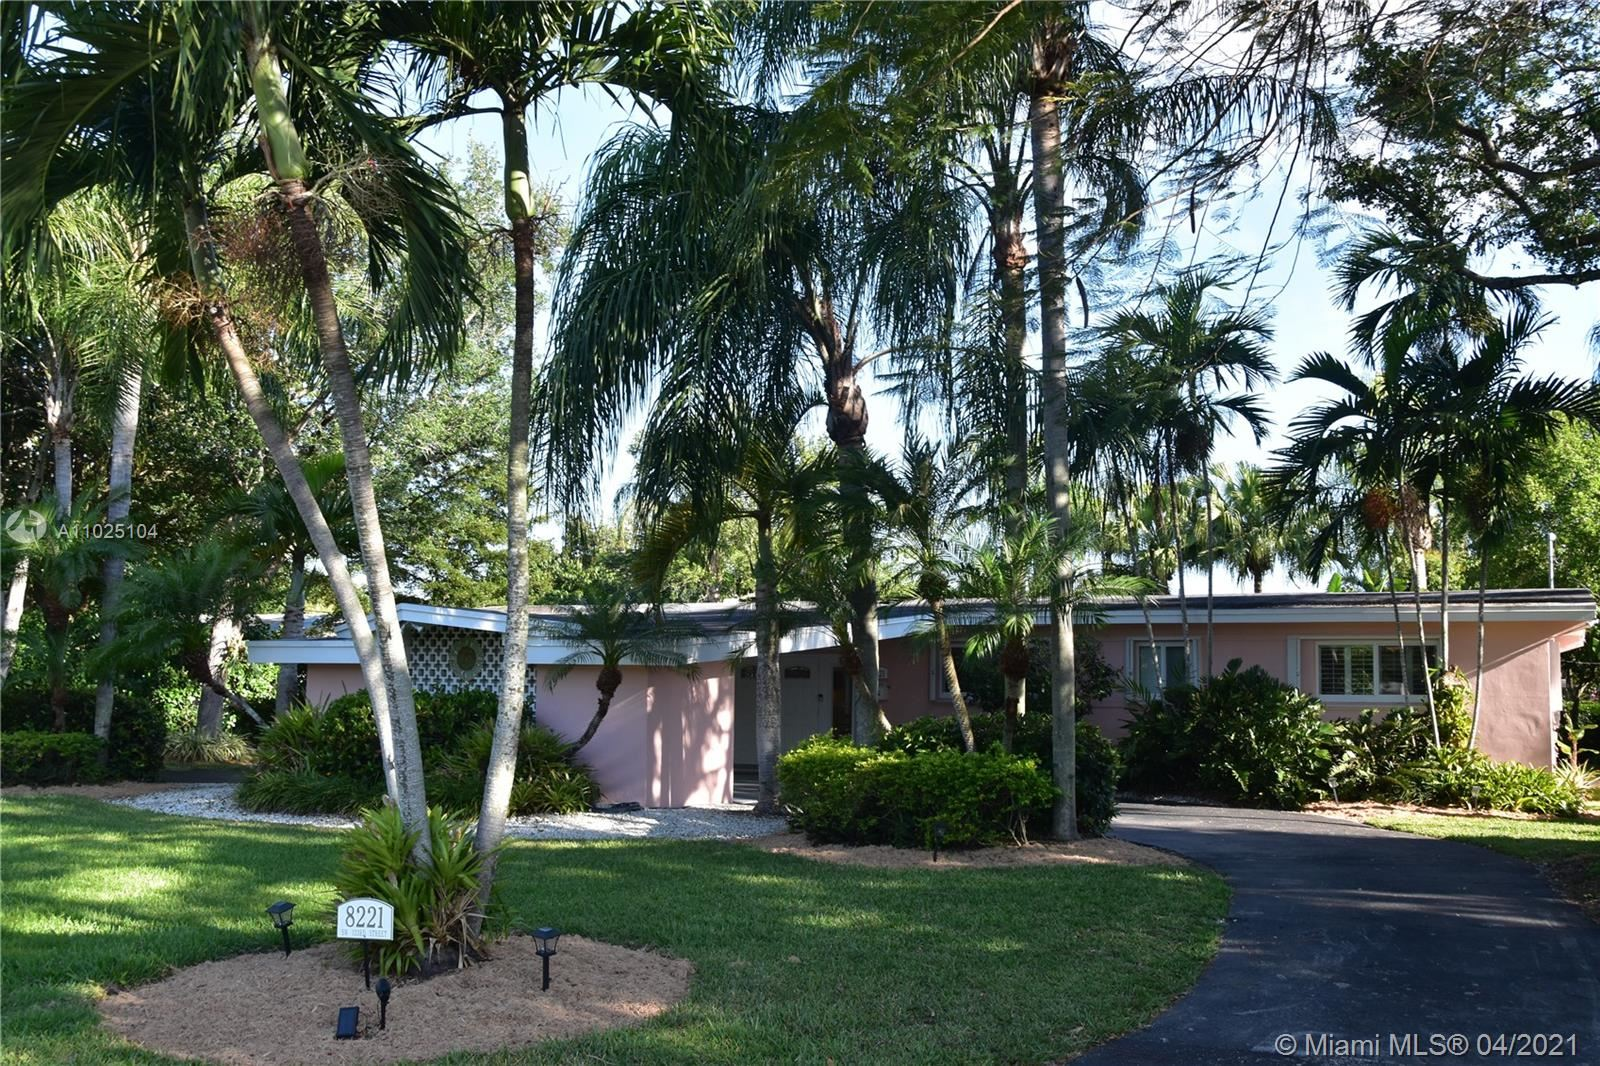 8221 SW 133rd St, Pinecrest, FL 33156 - #: A11025104